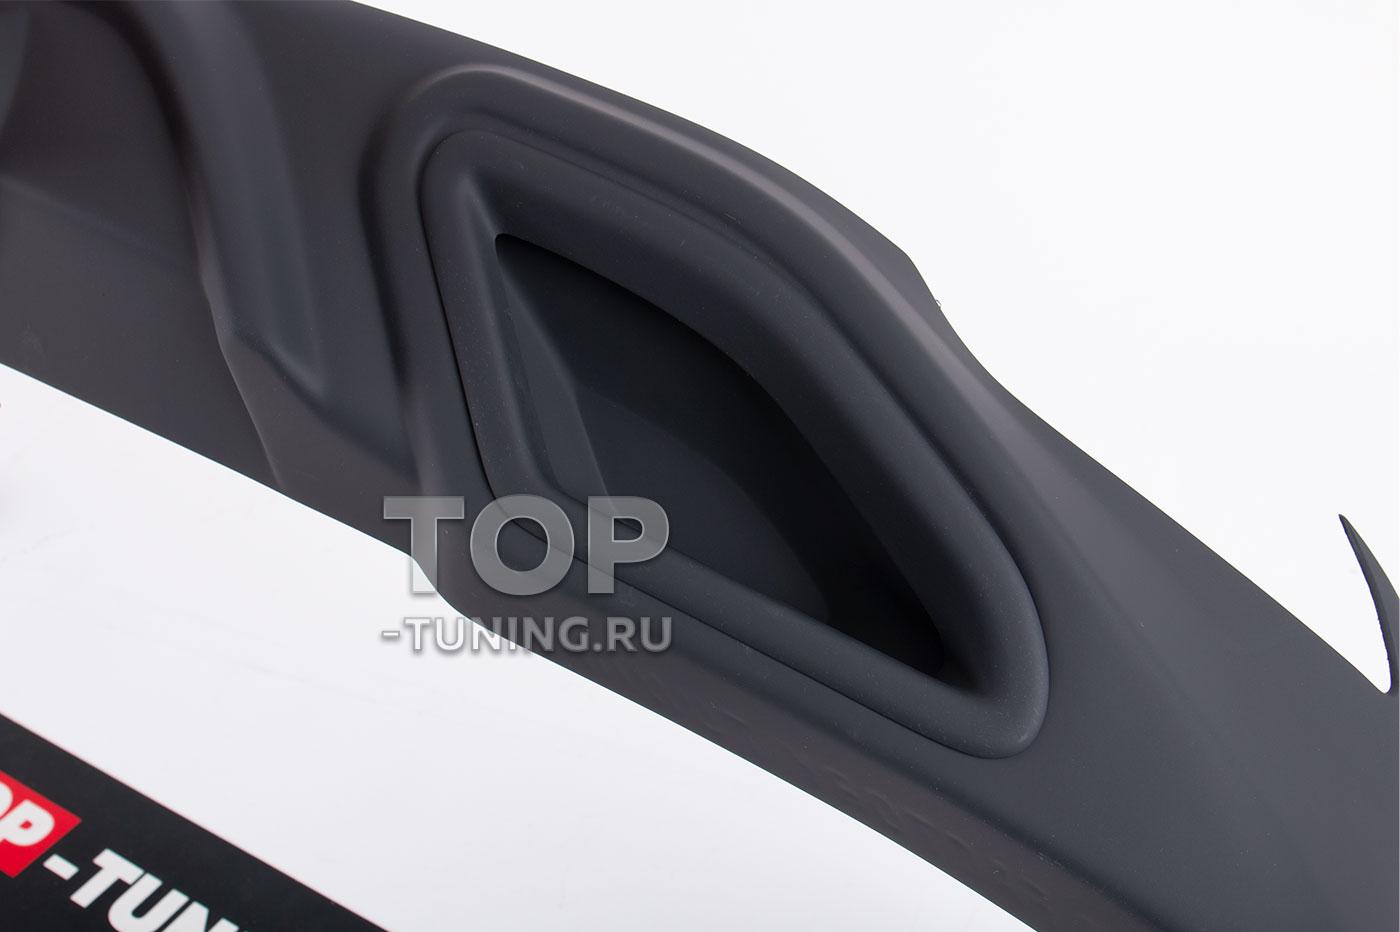 10176 Накладка Consul на задний бампер для Toyota Camry XV70 2L (2.5)